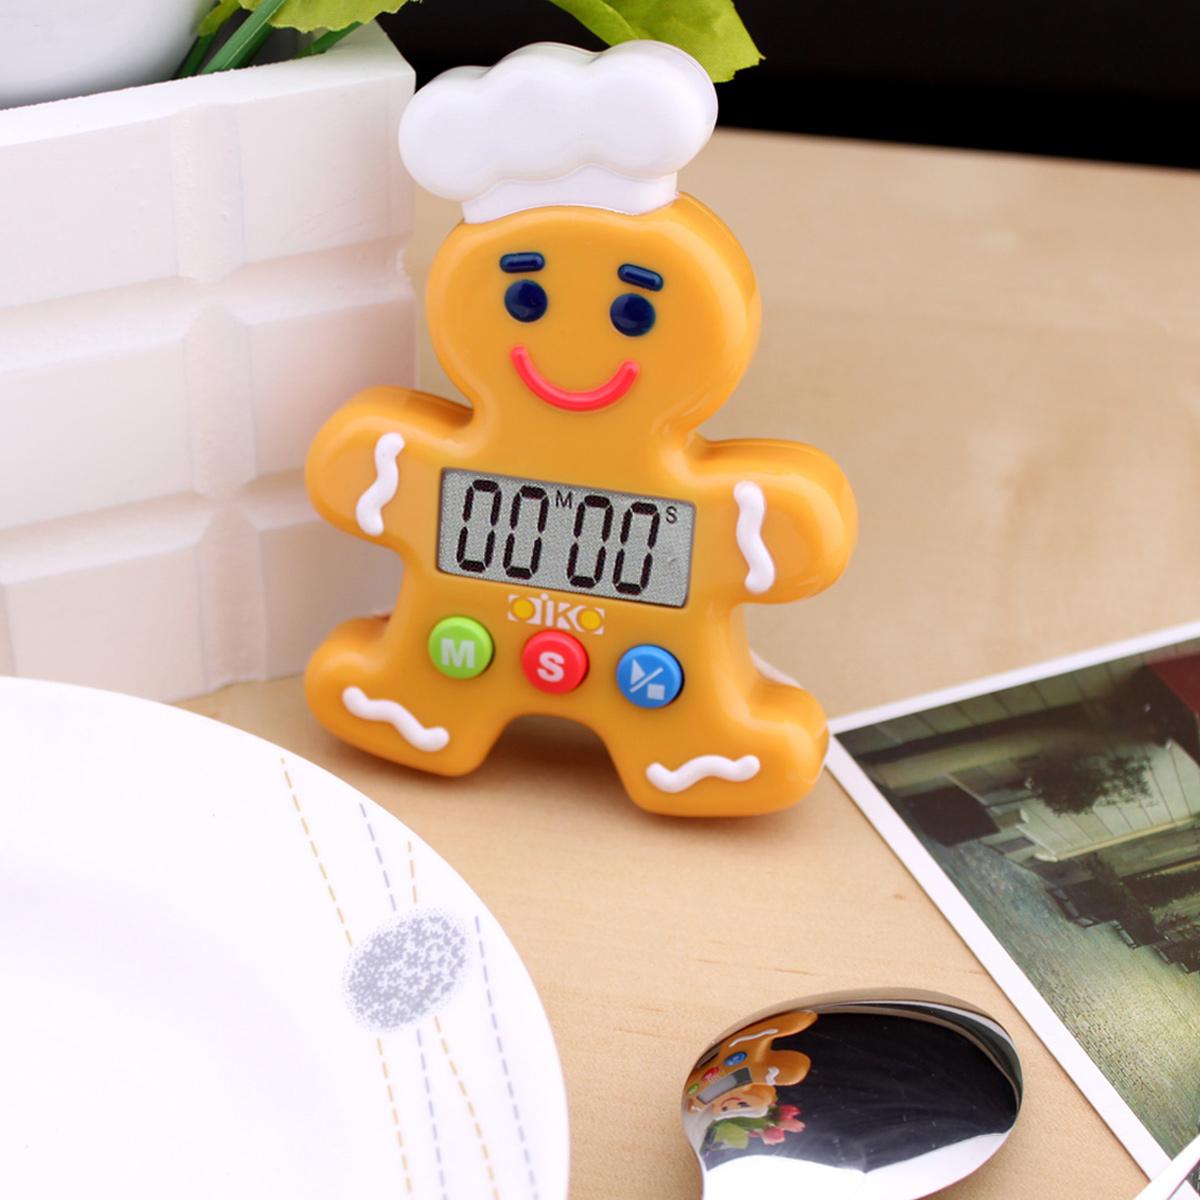 Кухонные таймеры Артикул 45040107752